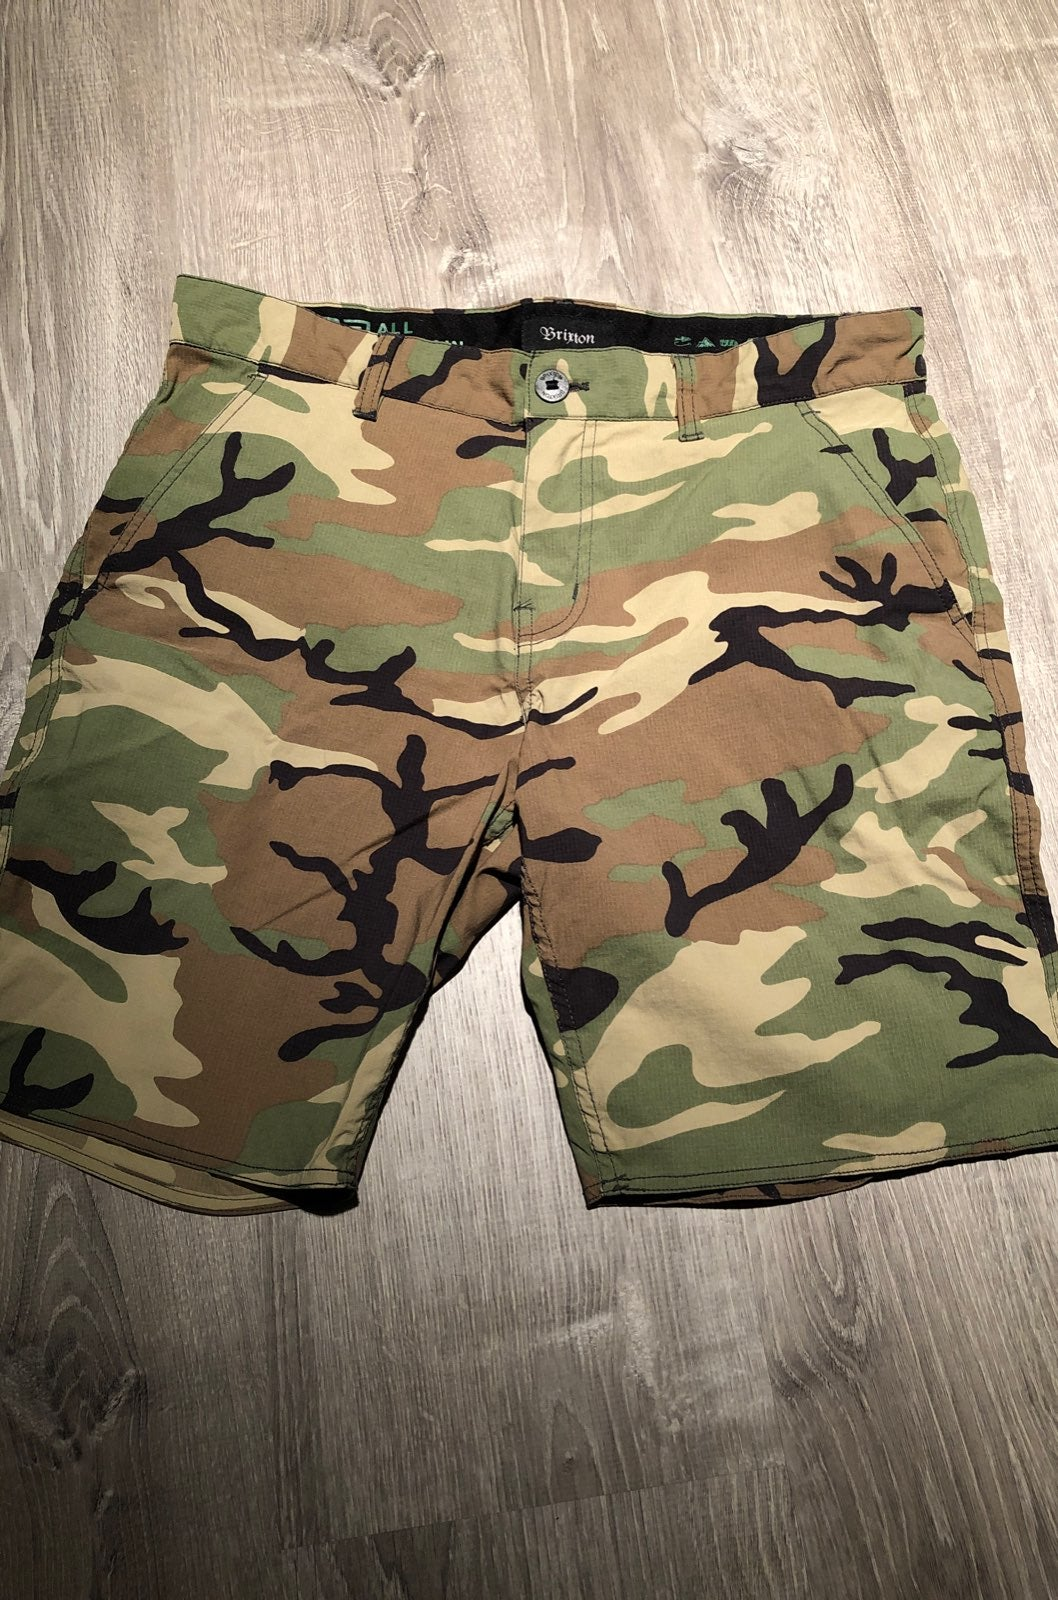 Brixton mens shorts size 33 hybrid short